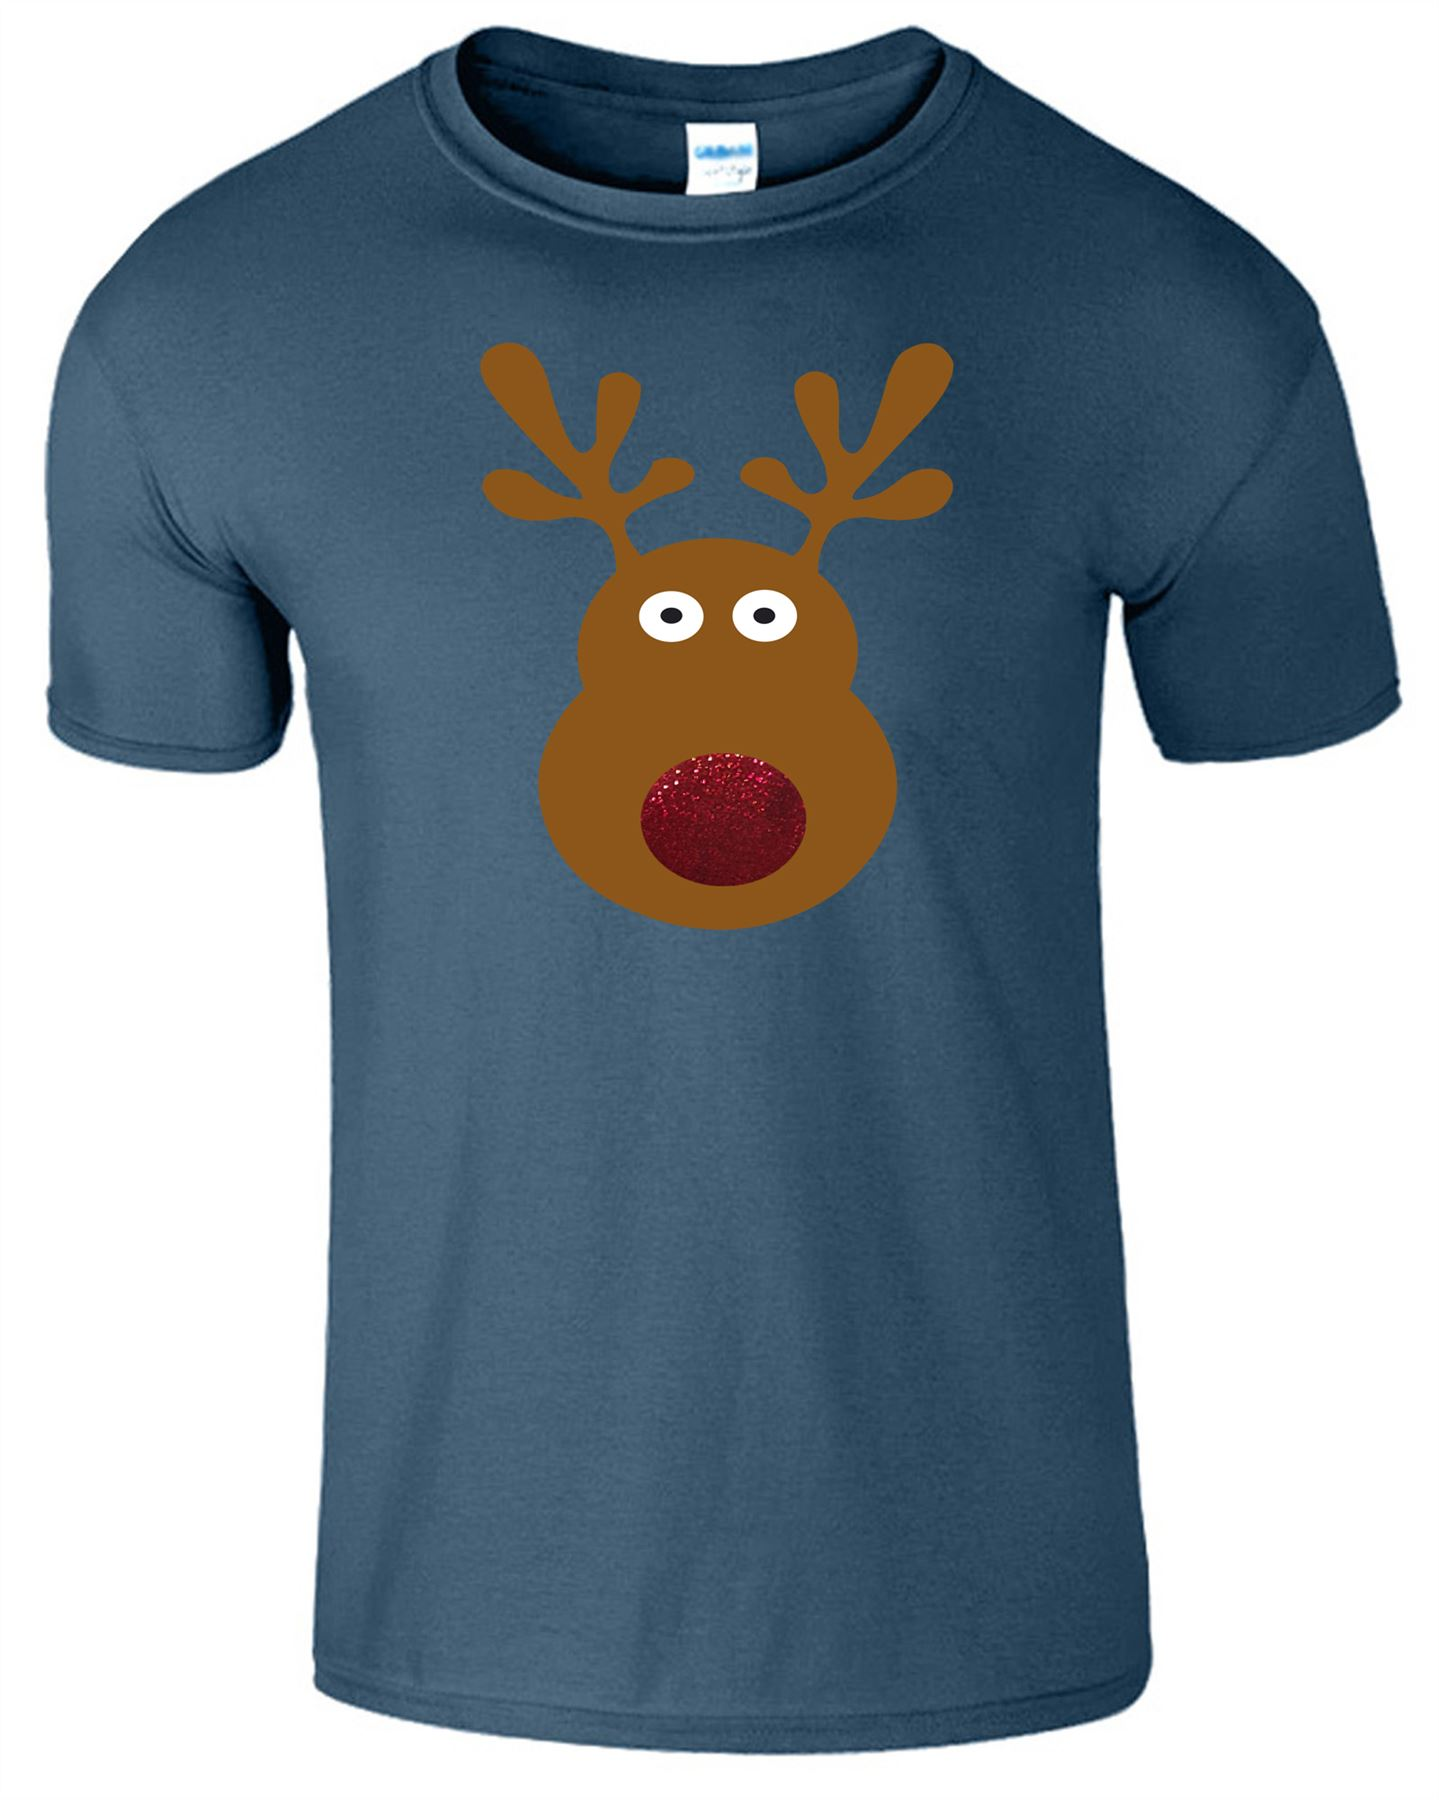 Rudolph Reindeer Glitter Nose Mens Kids T-Shirt Merry Christmas Xmas Gift TShirt